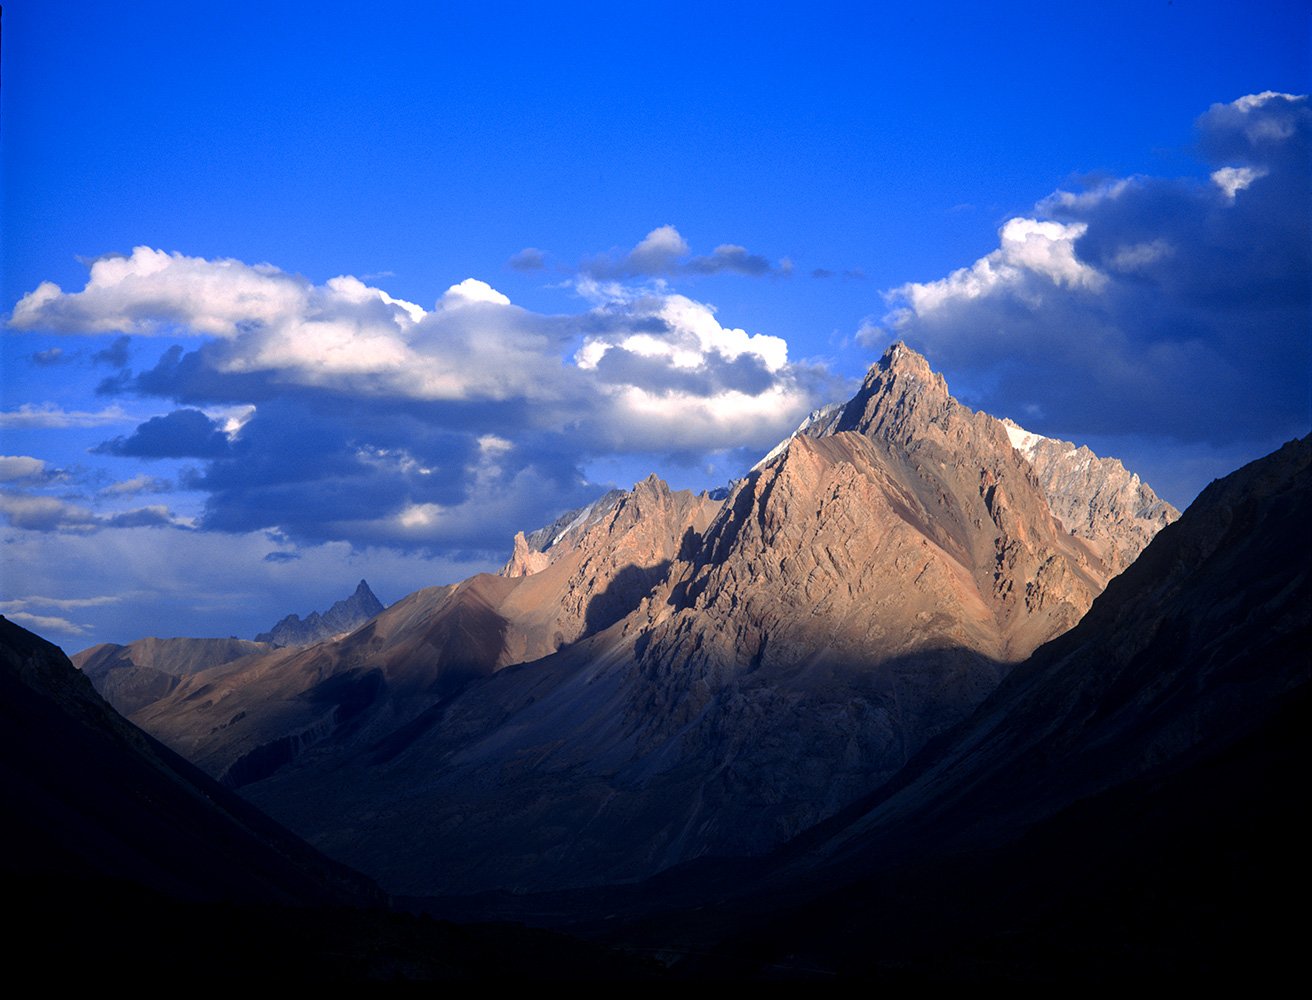 Afternoon light from Baba Ghundi Ziarat, an Ishmaili shrine in the upper Chapursan valley.Bronica ETRSi, Fuji Velvia